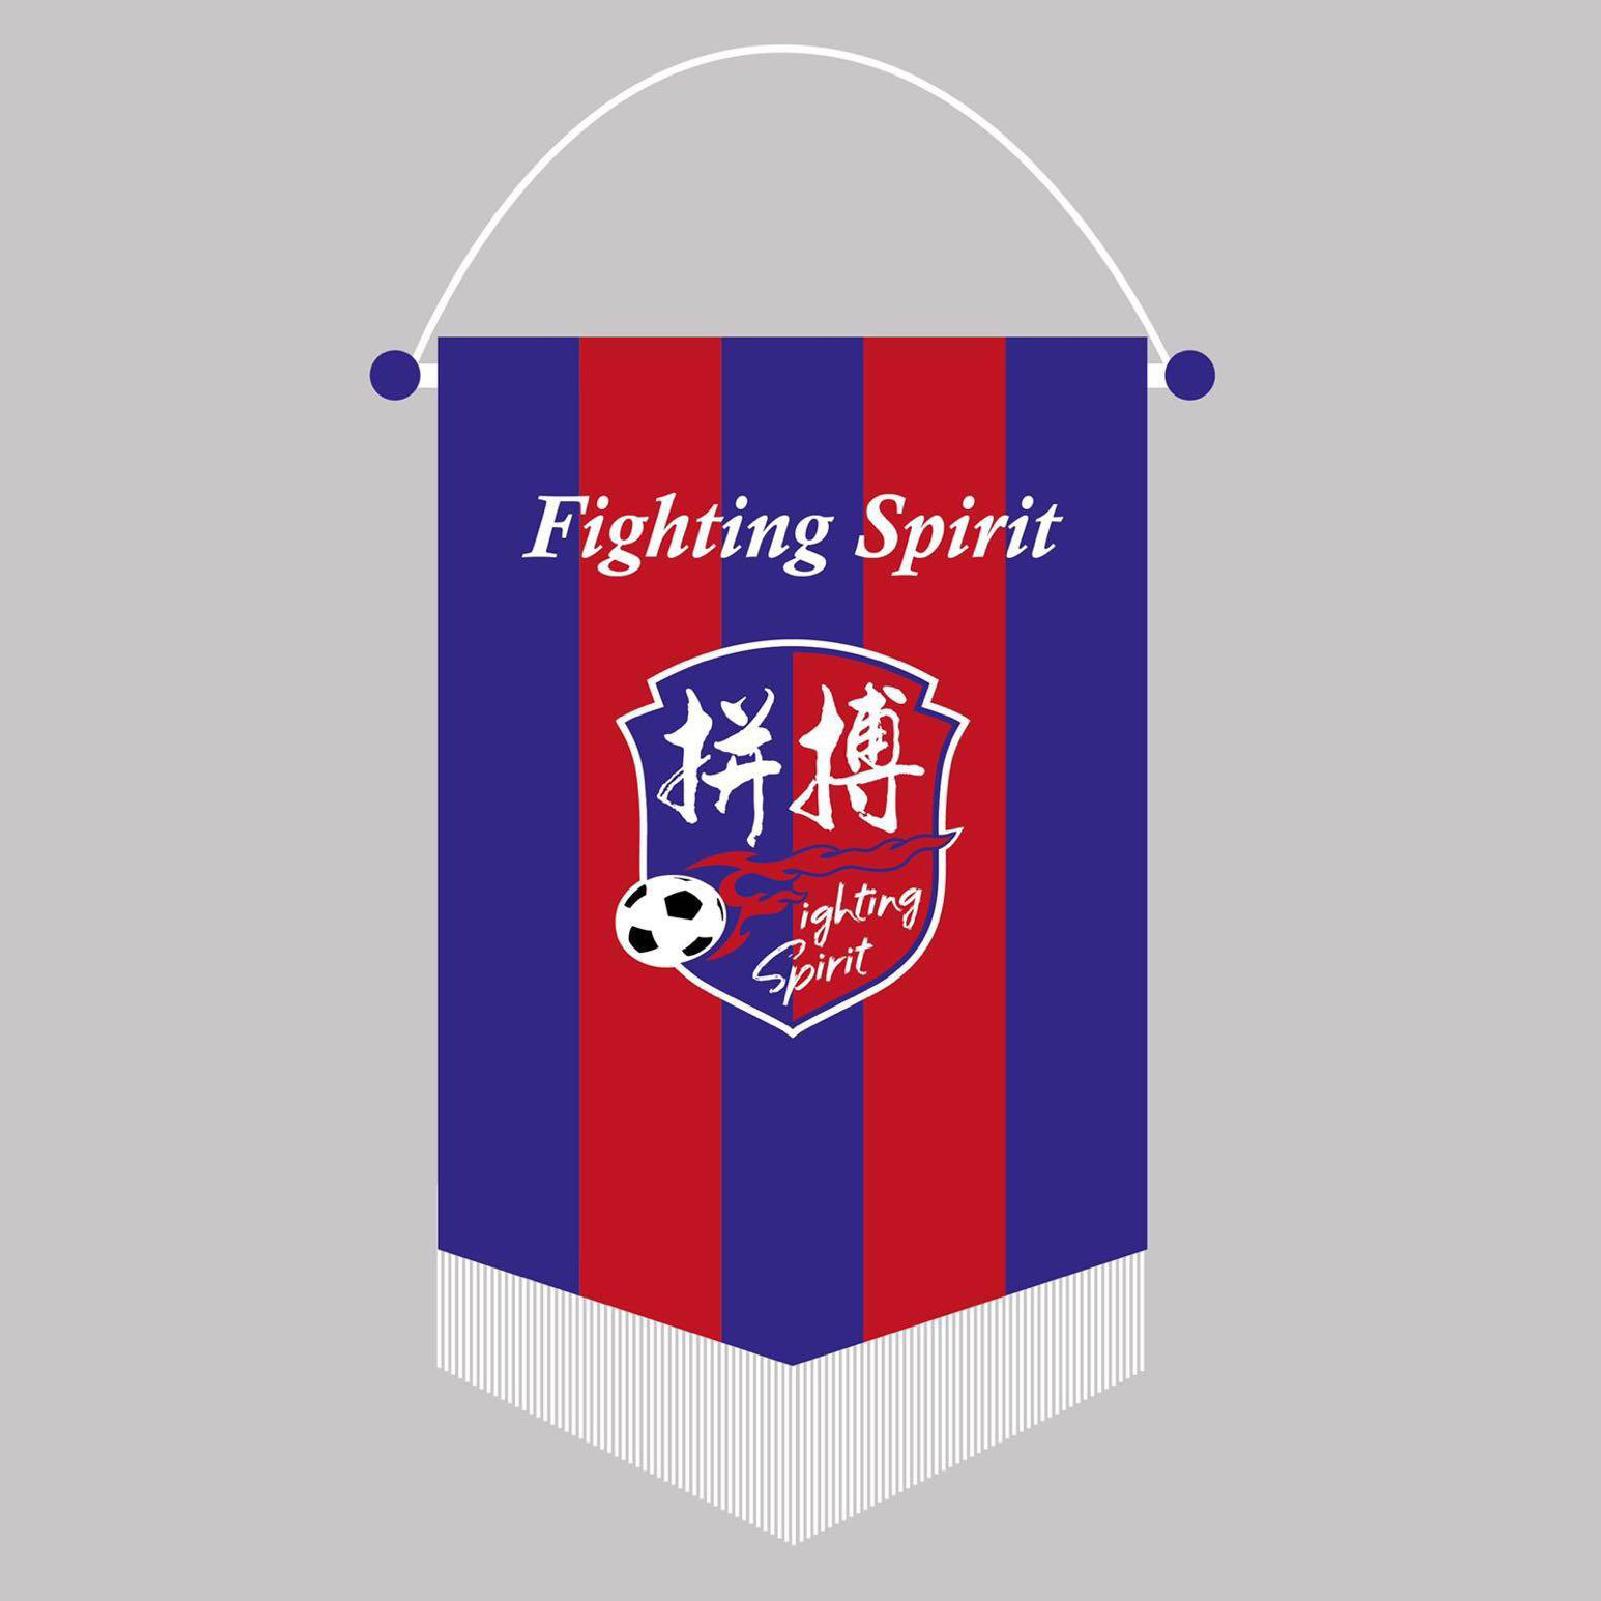 Fightingspirit_flag.png